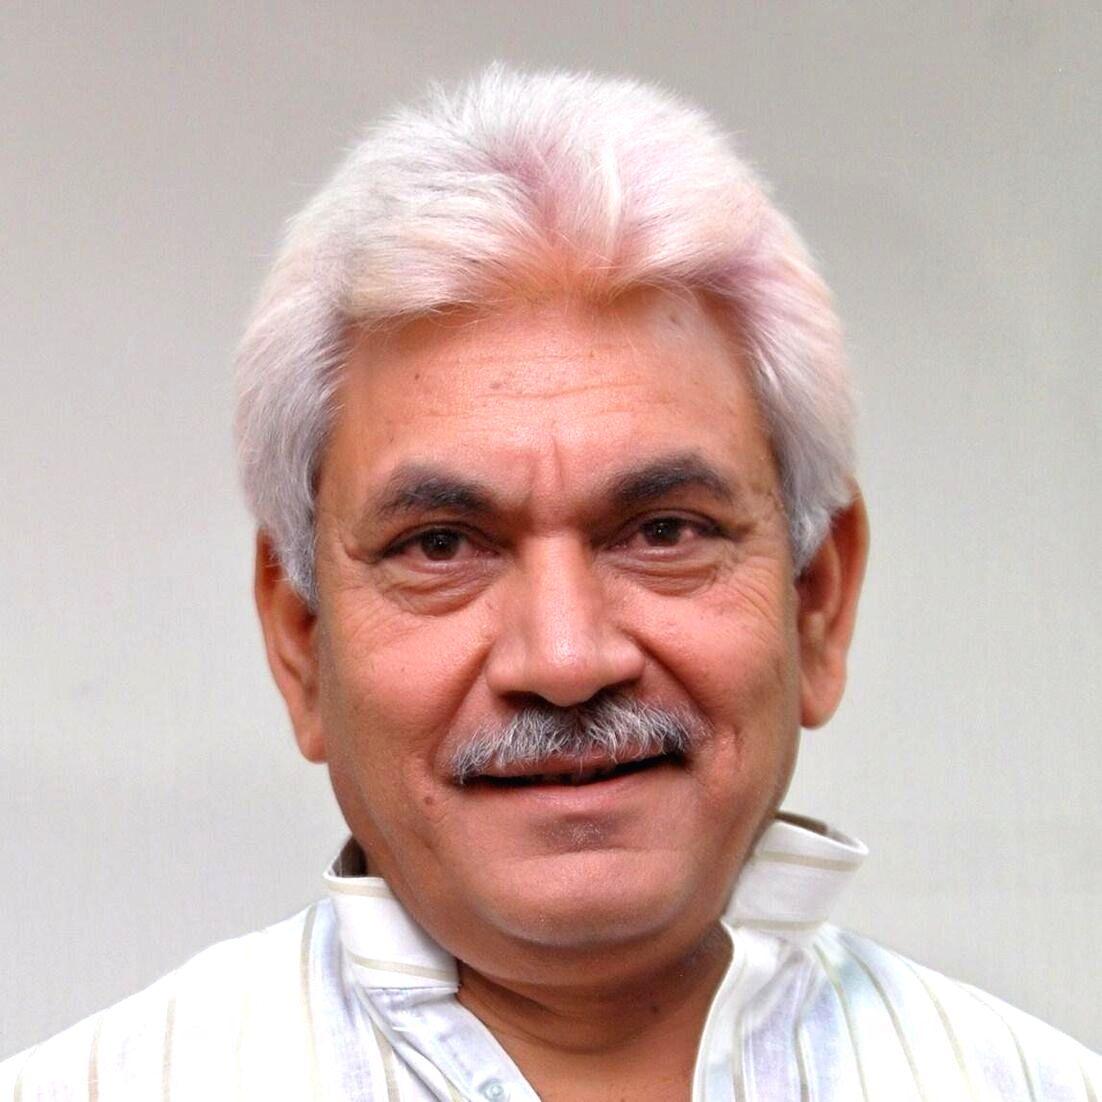 In Kashmir, Covid-19 draws LG Manoj Sinha and mainstream politicians into a huddle.